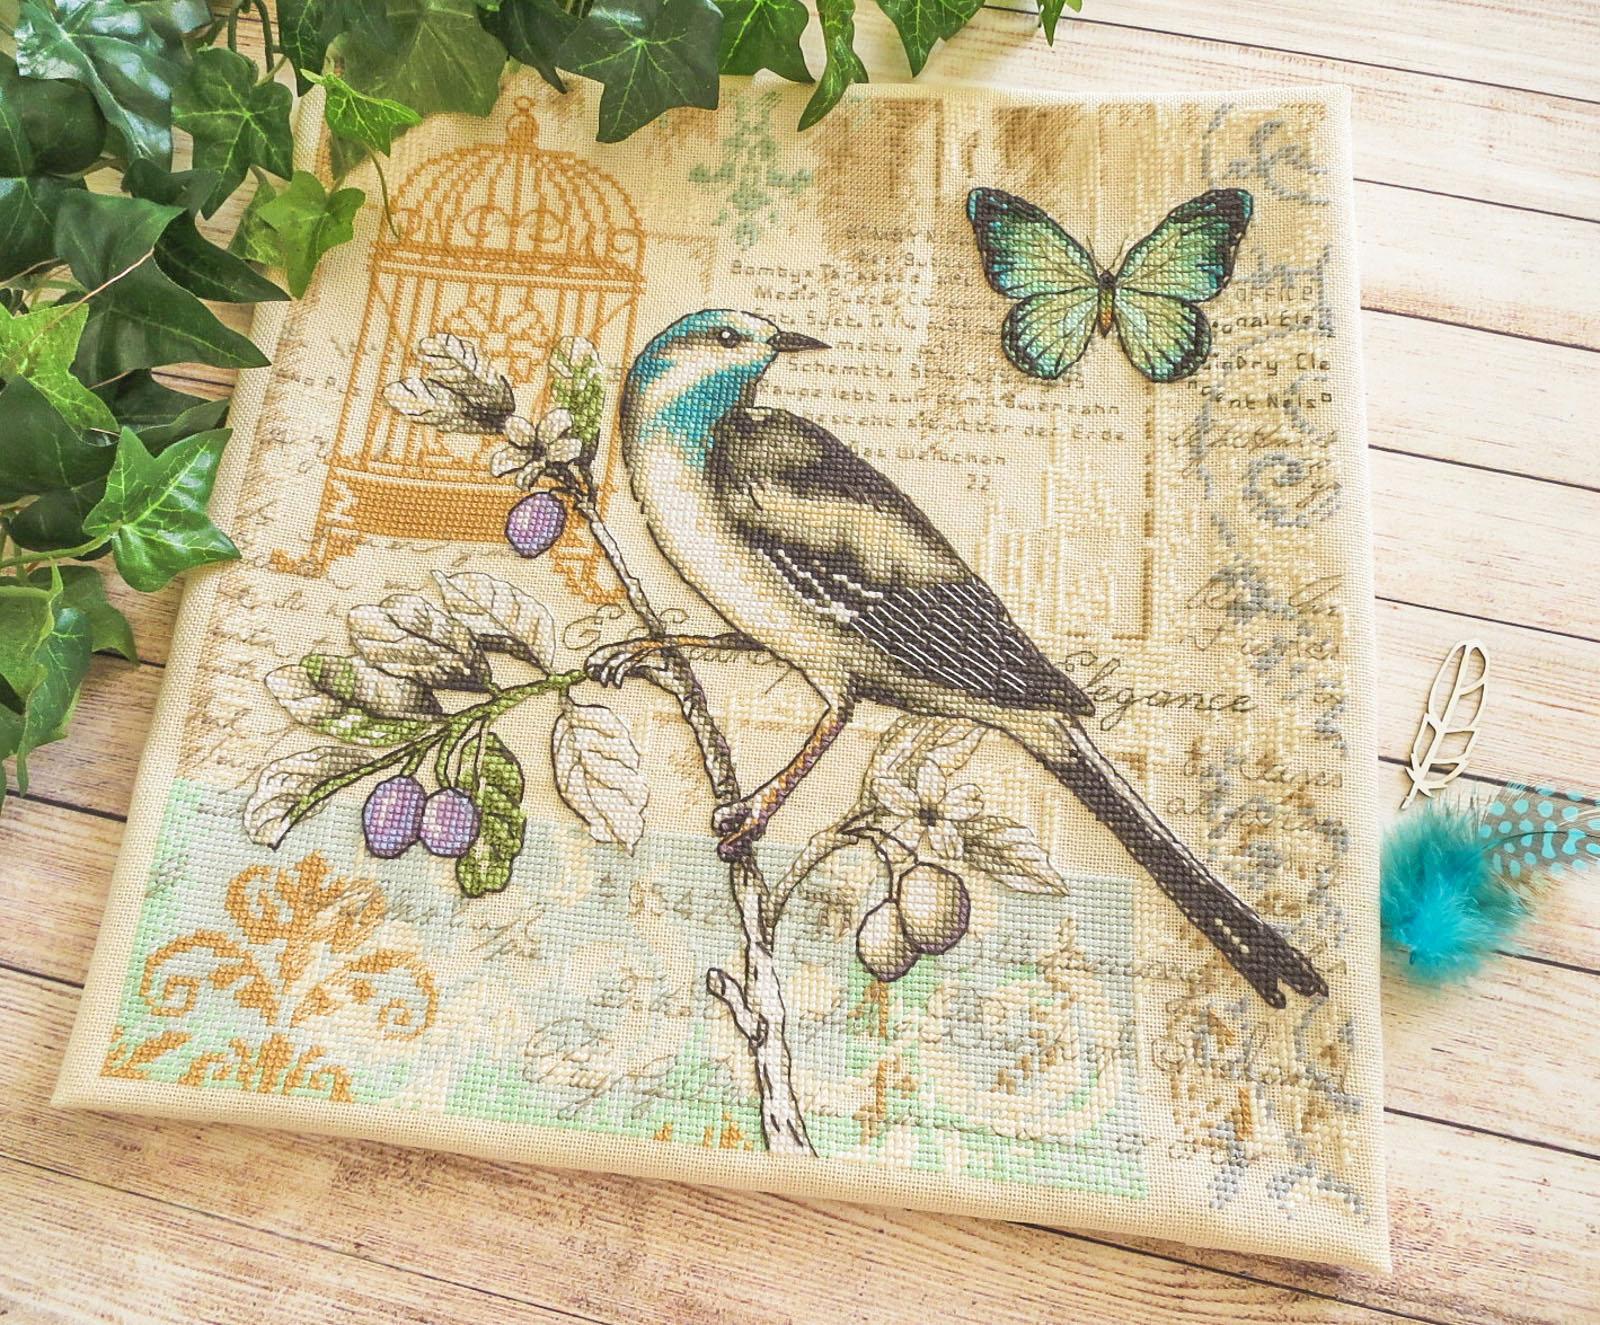 nature study dimensions, embroidery, вышитая картина, дименшинс, Dimensions 35290, вишита хрестиком картина, вышивка крестиком, вышитая птица